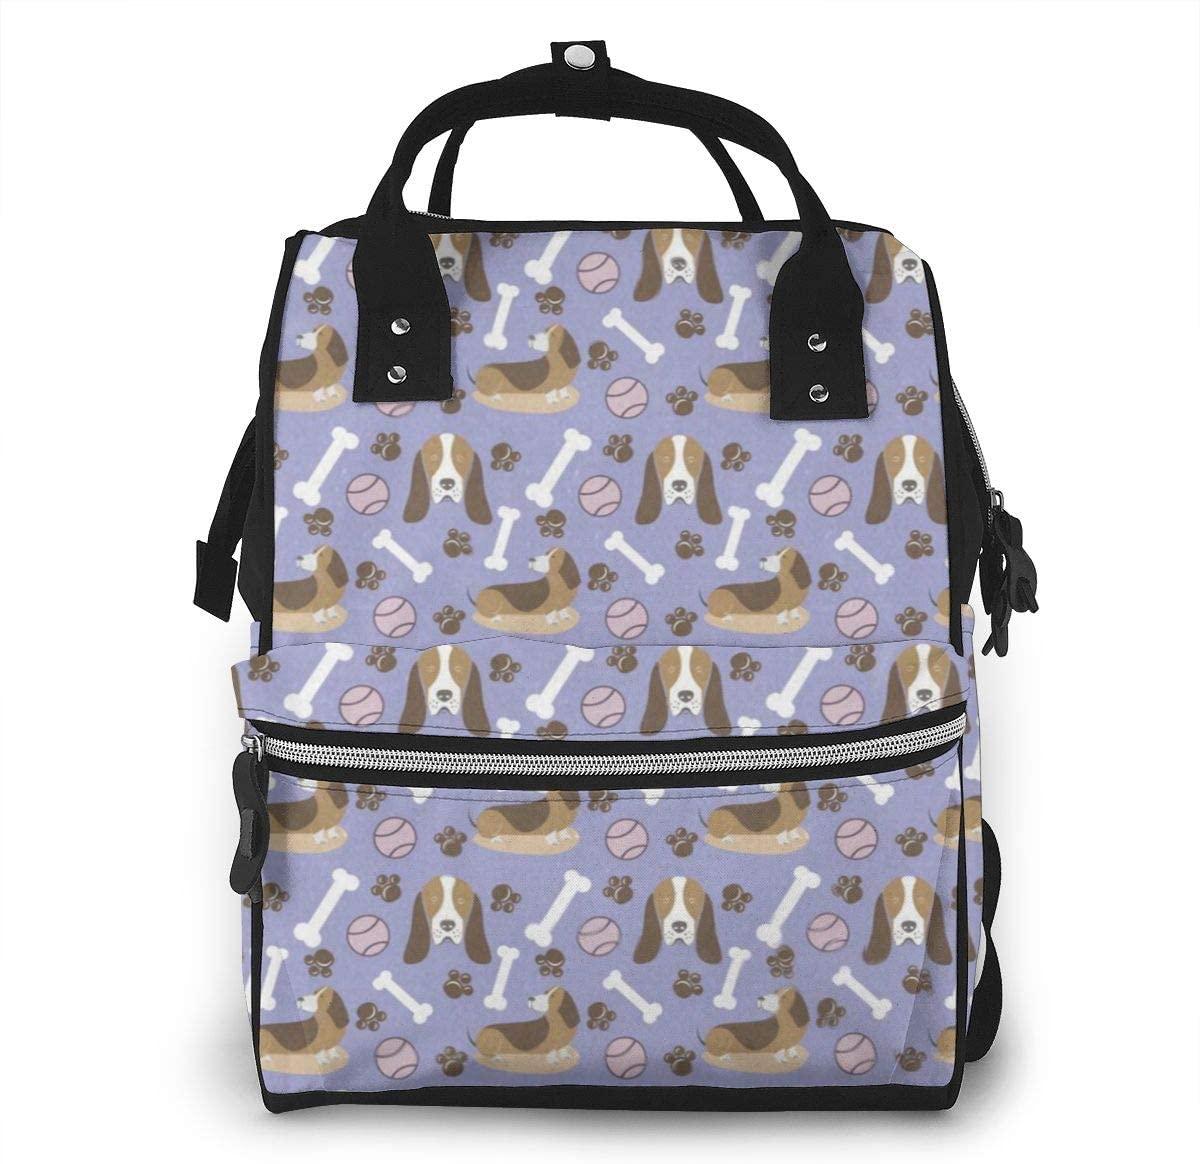 NiYoung Women Casual Zippers Large Capacity Backpack Mummy Bag Swim Diapers,Baseball Bone Basset Hound Puppy Pattern